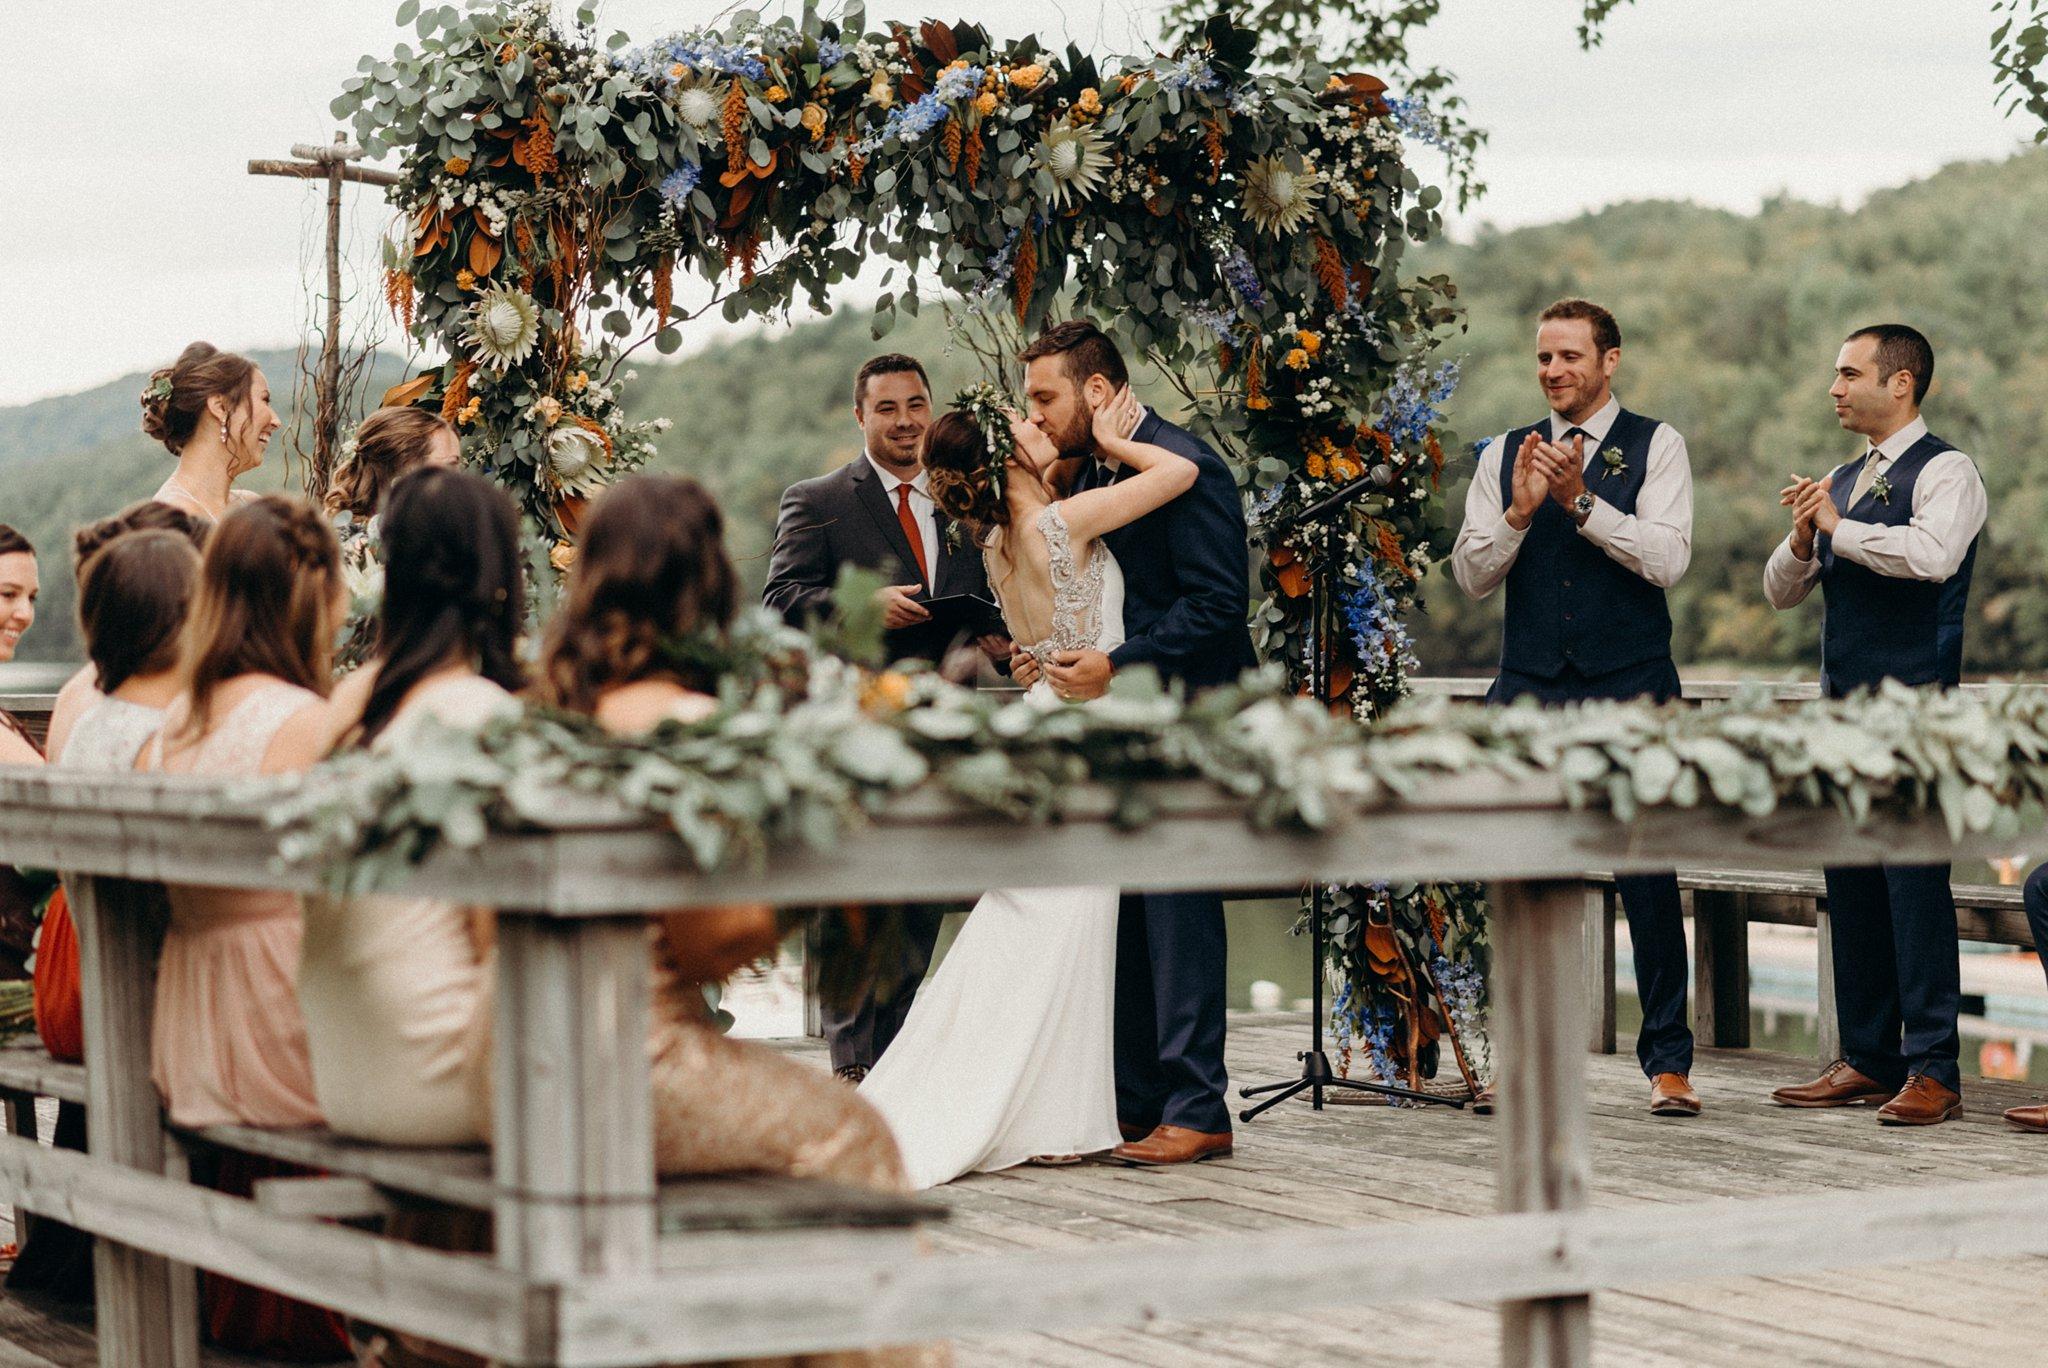 kaihla_tonai_intimate_wedding_elopement_photographer_6645.jpg